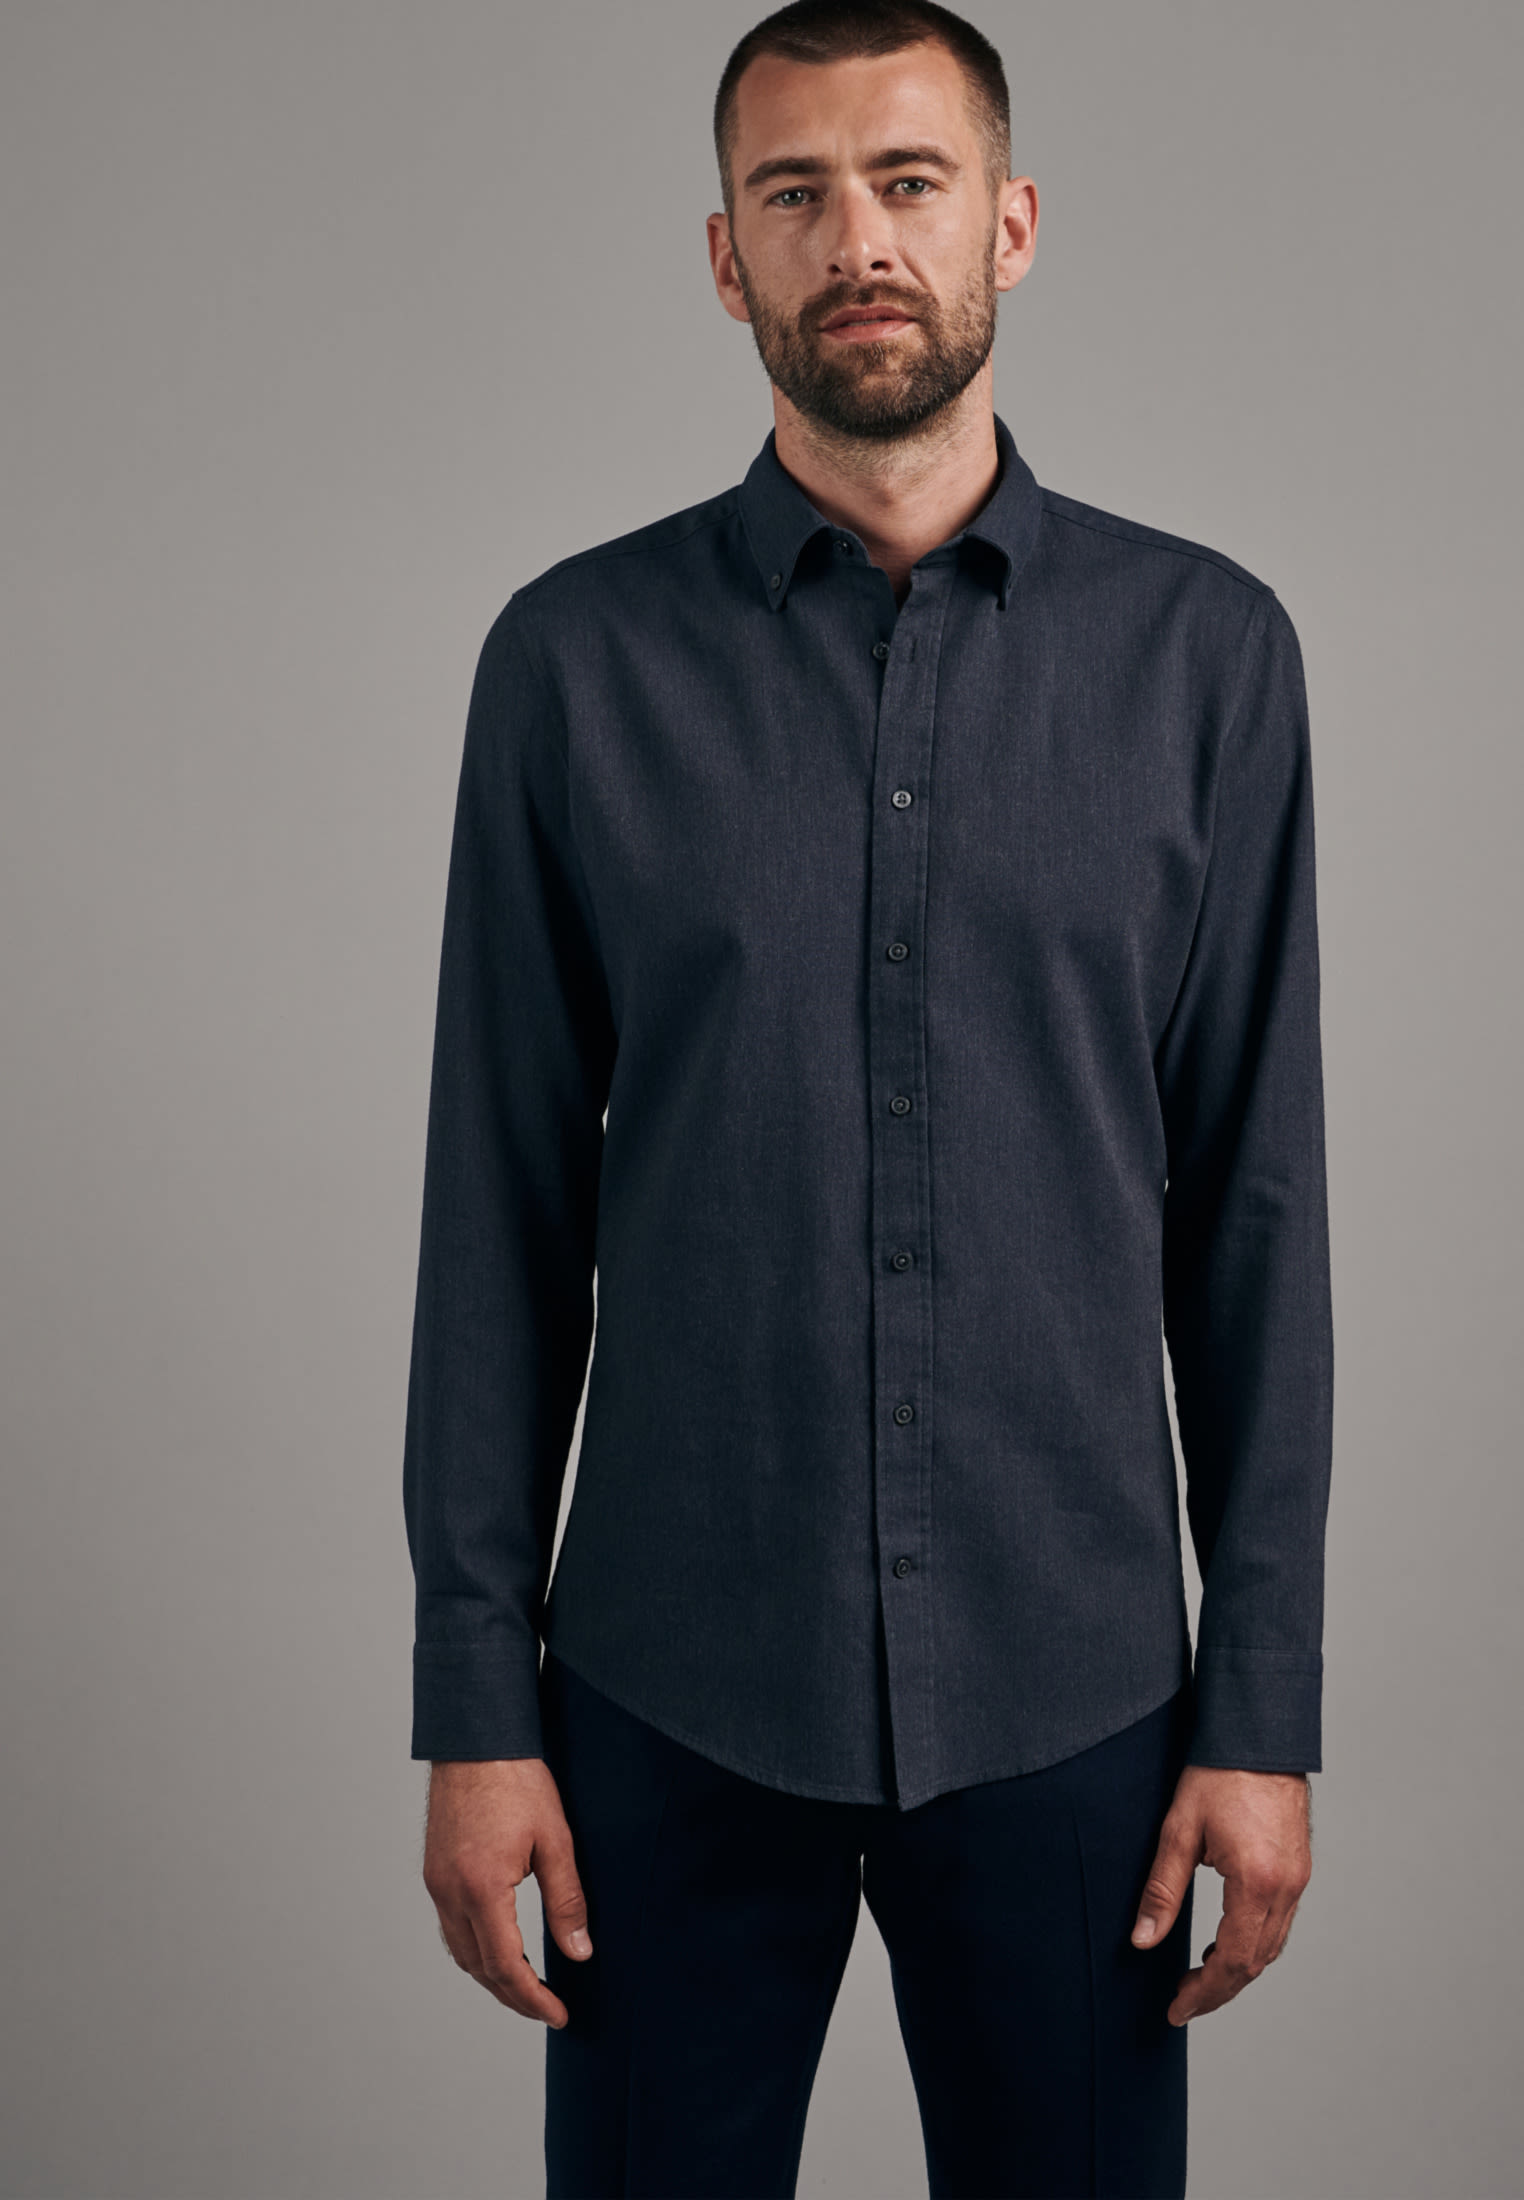 Panama Business Shirt in Slim with Button-Down-Collar in Grey |  Seidensticker Onlineshop